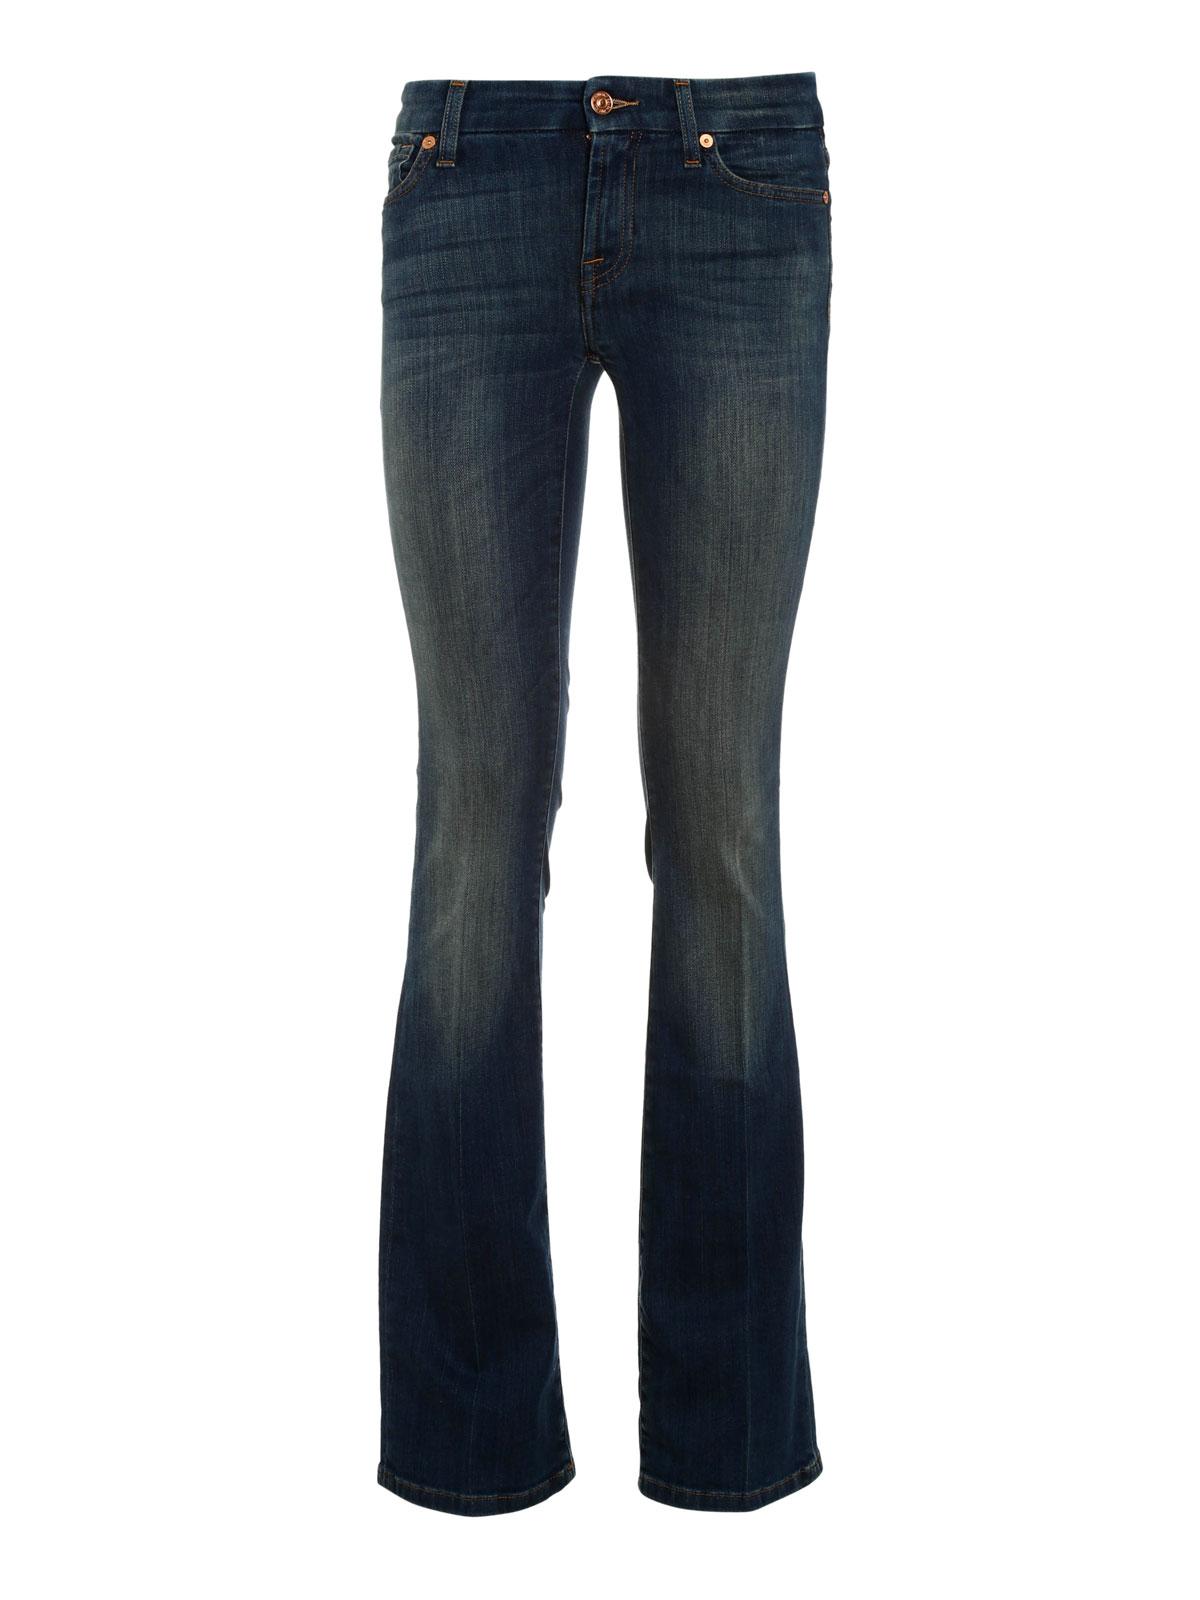 jeans a vita alta 7 for all mankind jeans bootcut ikrix. Black Bedroom Furniture Sets. Home Design Ideas